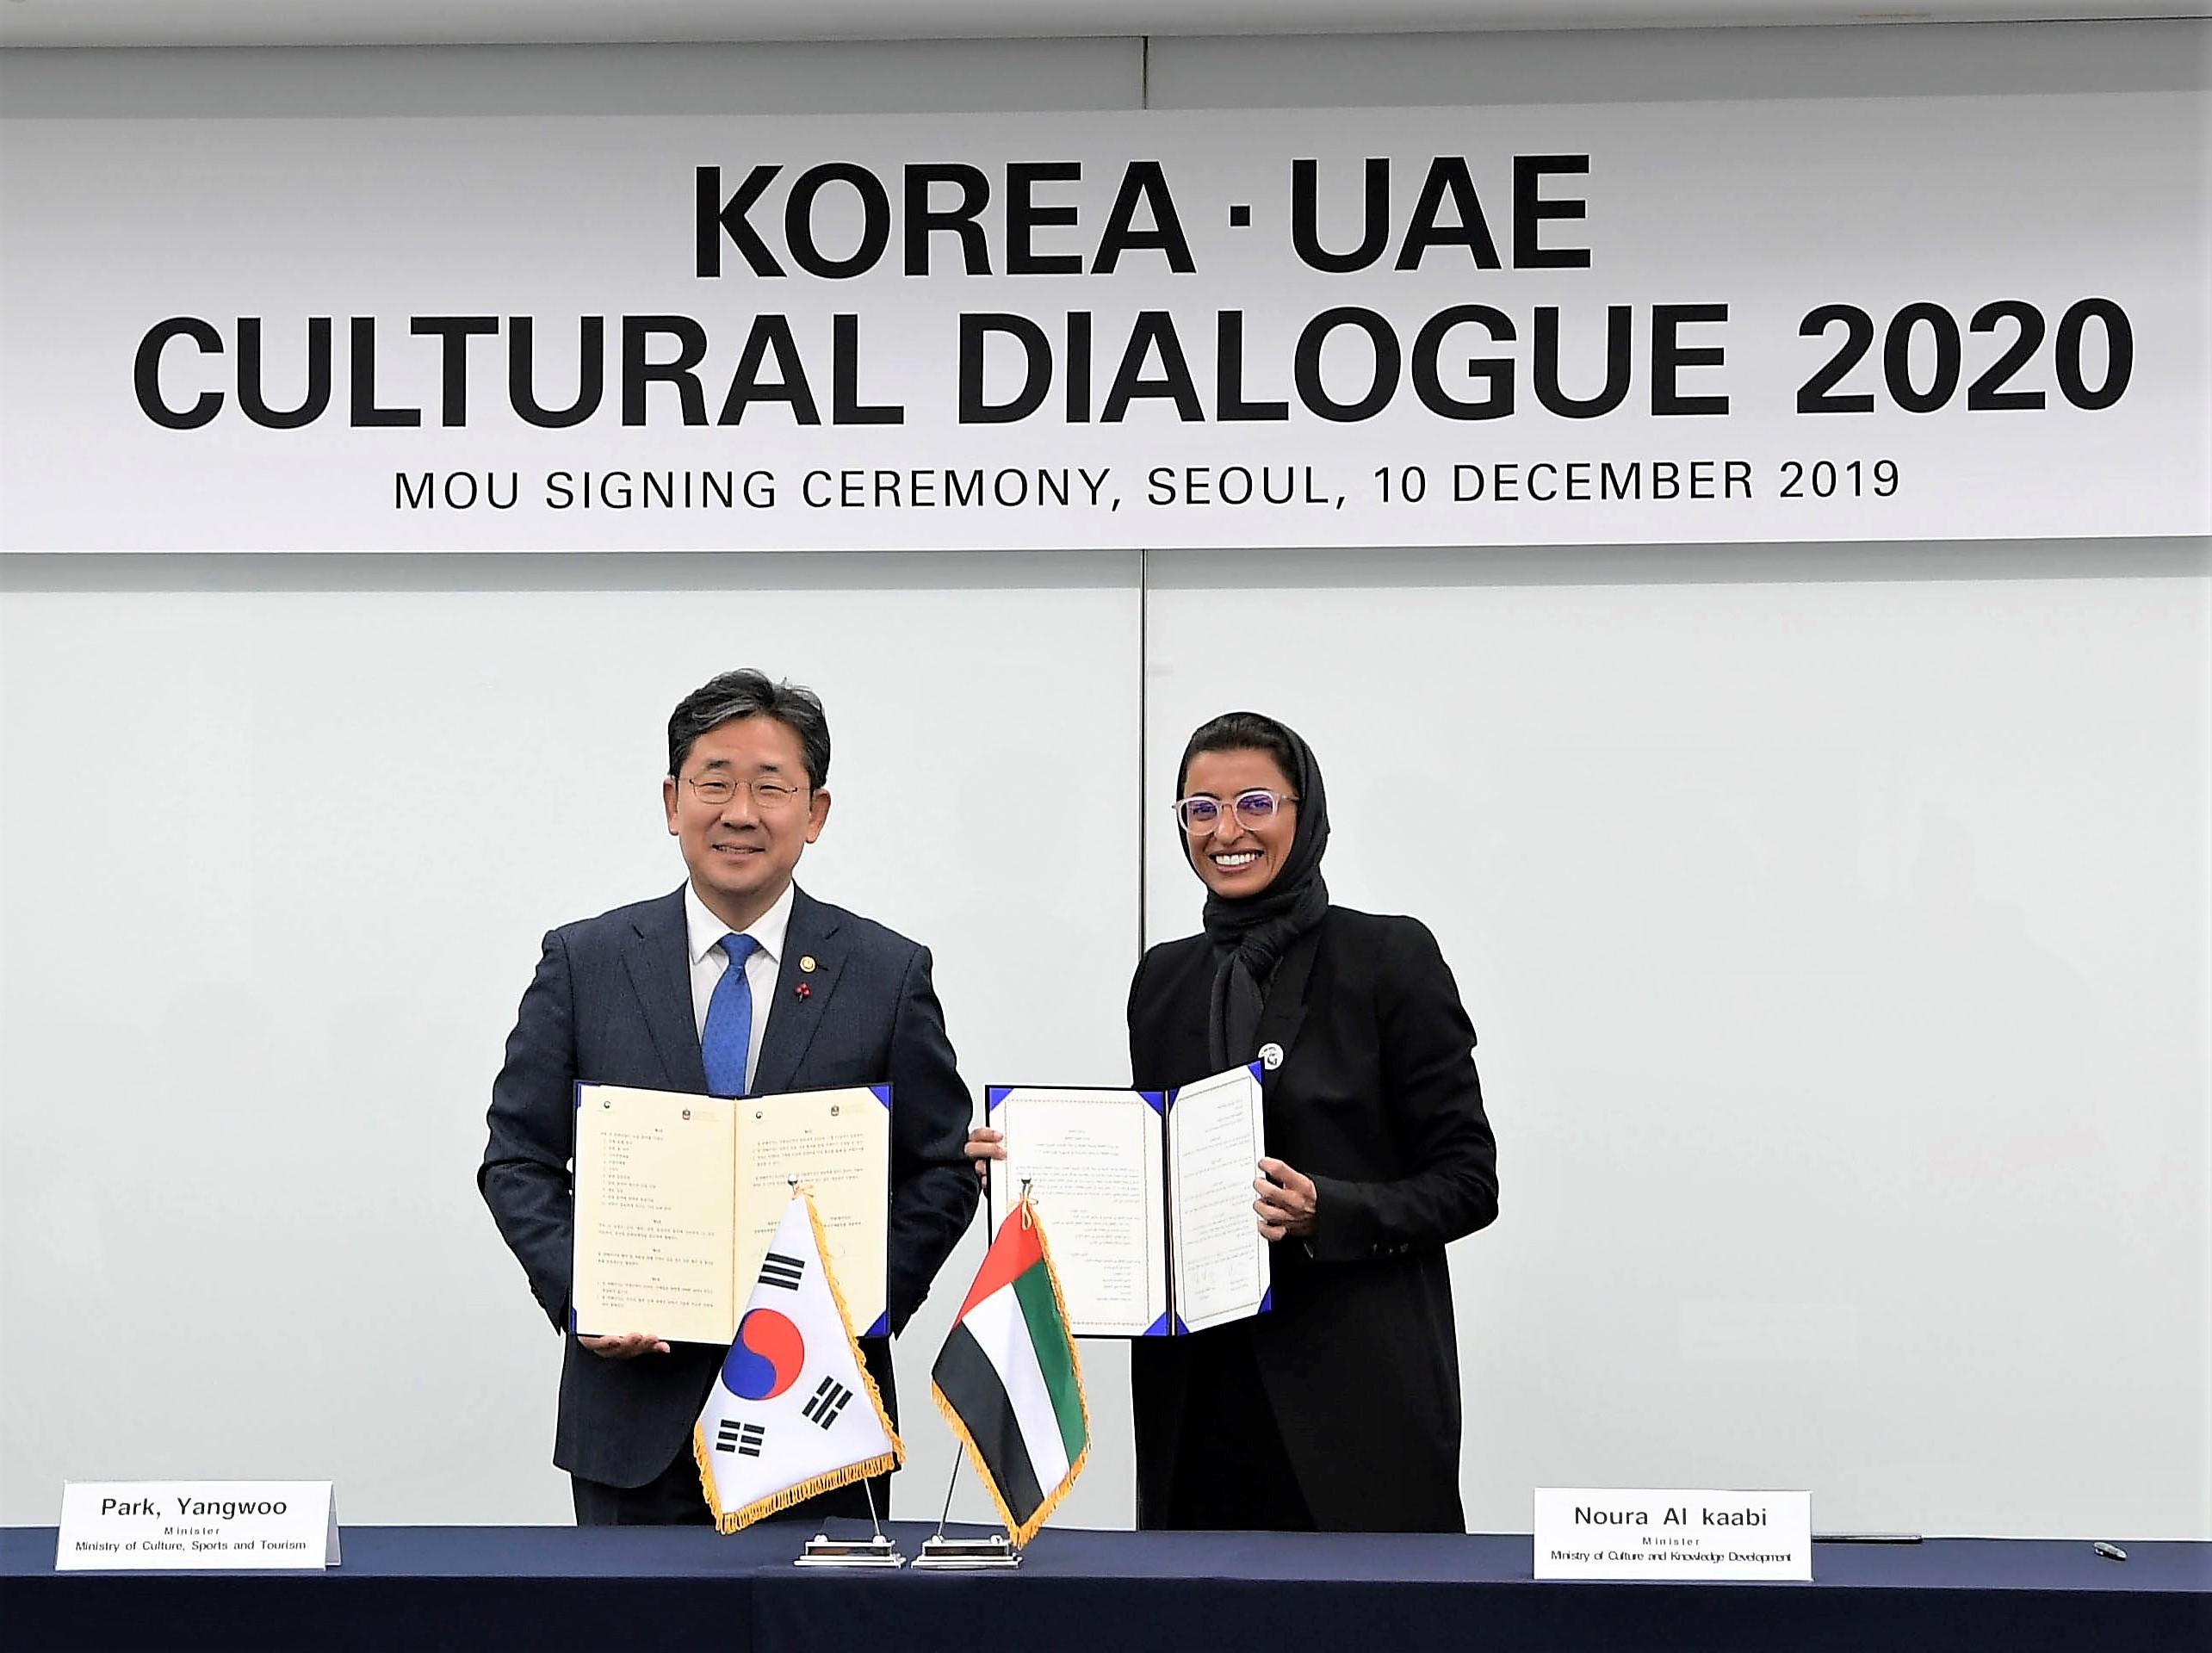 uae-korea cultural dialogue 2020 announced in seoul 1